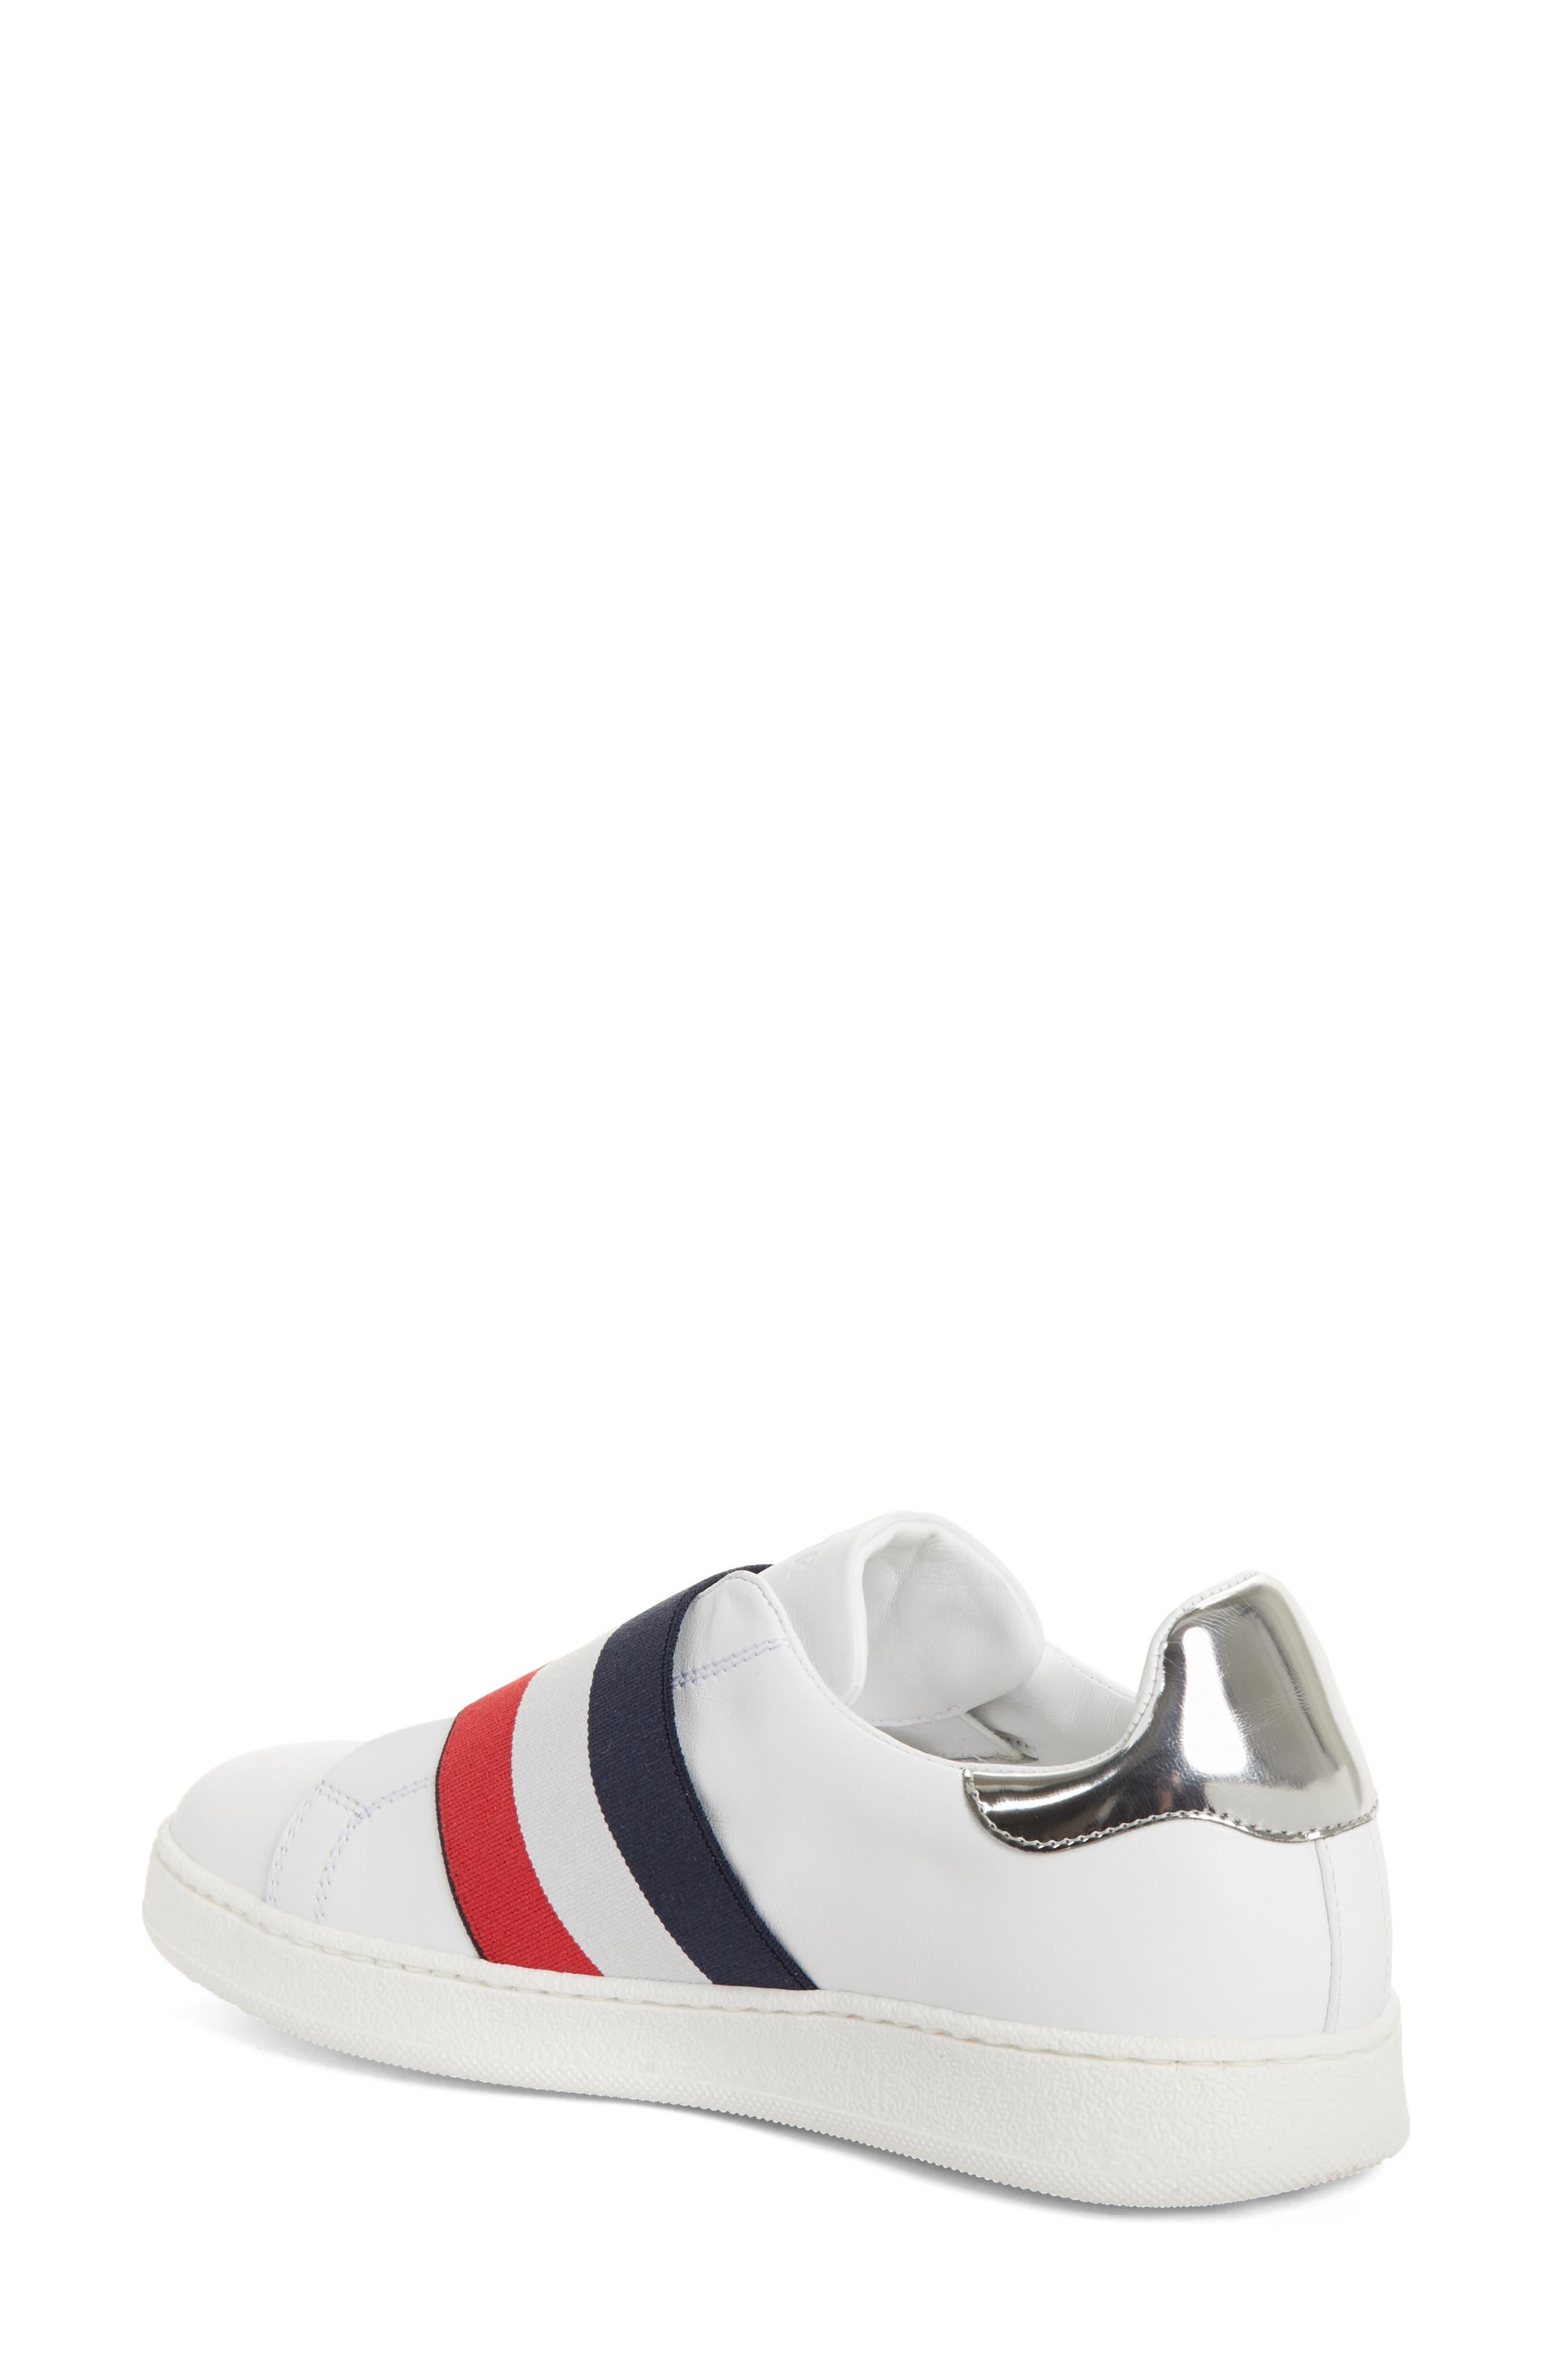 Alizee Low Top Sneaker,                             Alternate thumbnail 2, color,                             100